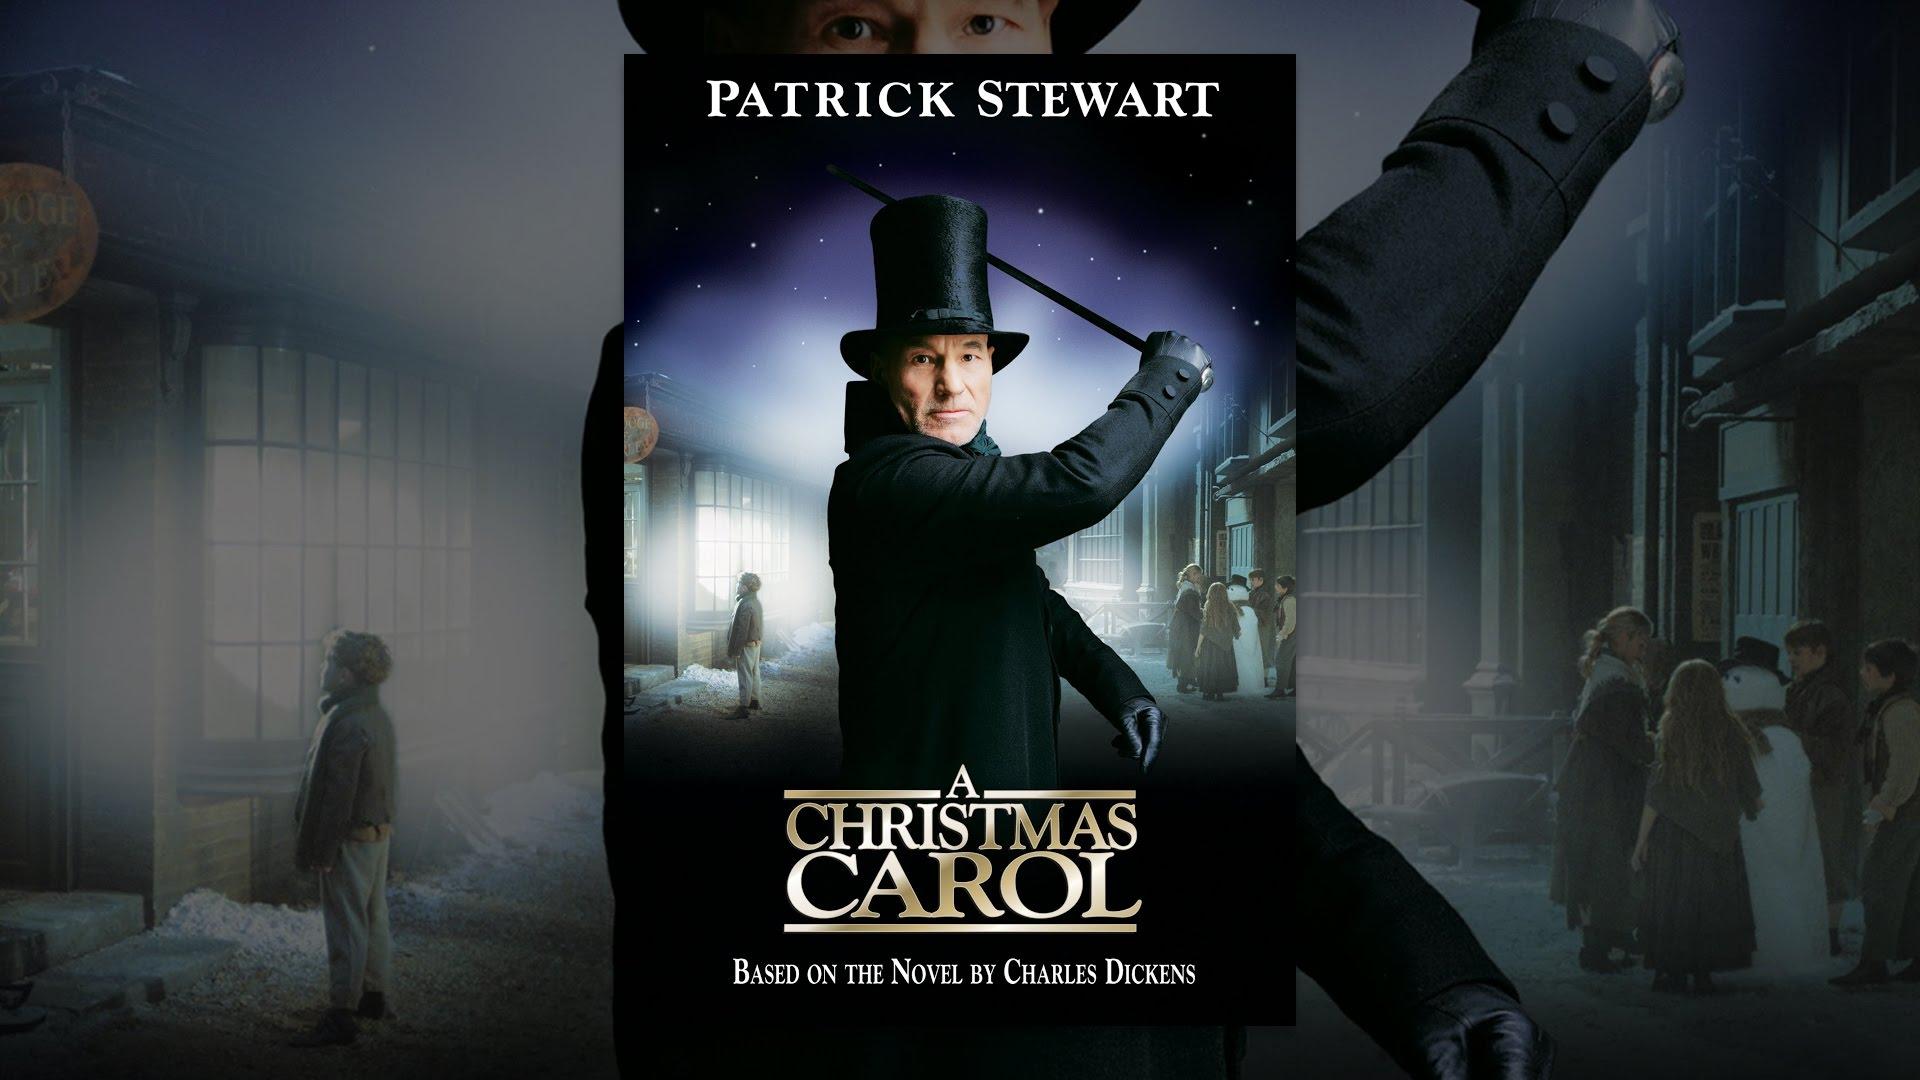 a christmas carol 1999 youtube movies - A Christmas Carol Movie 1999